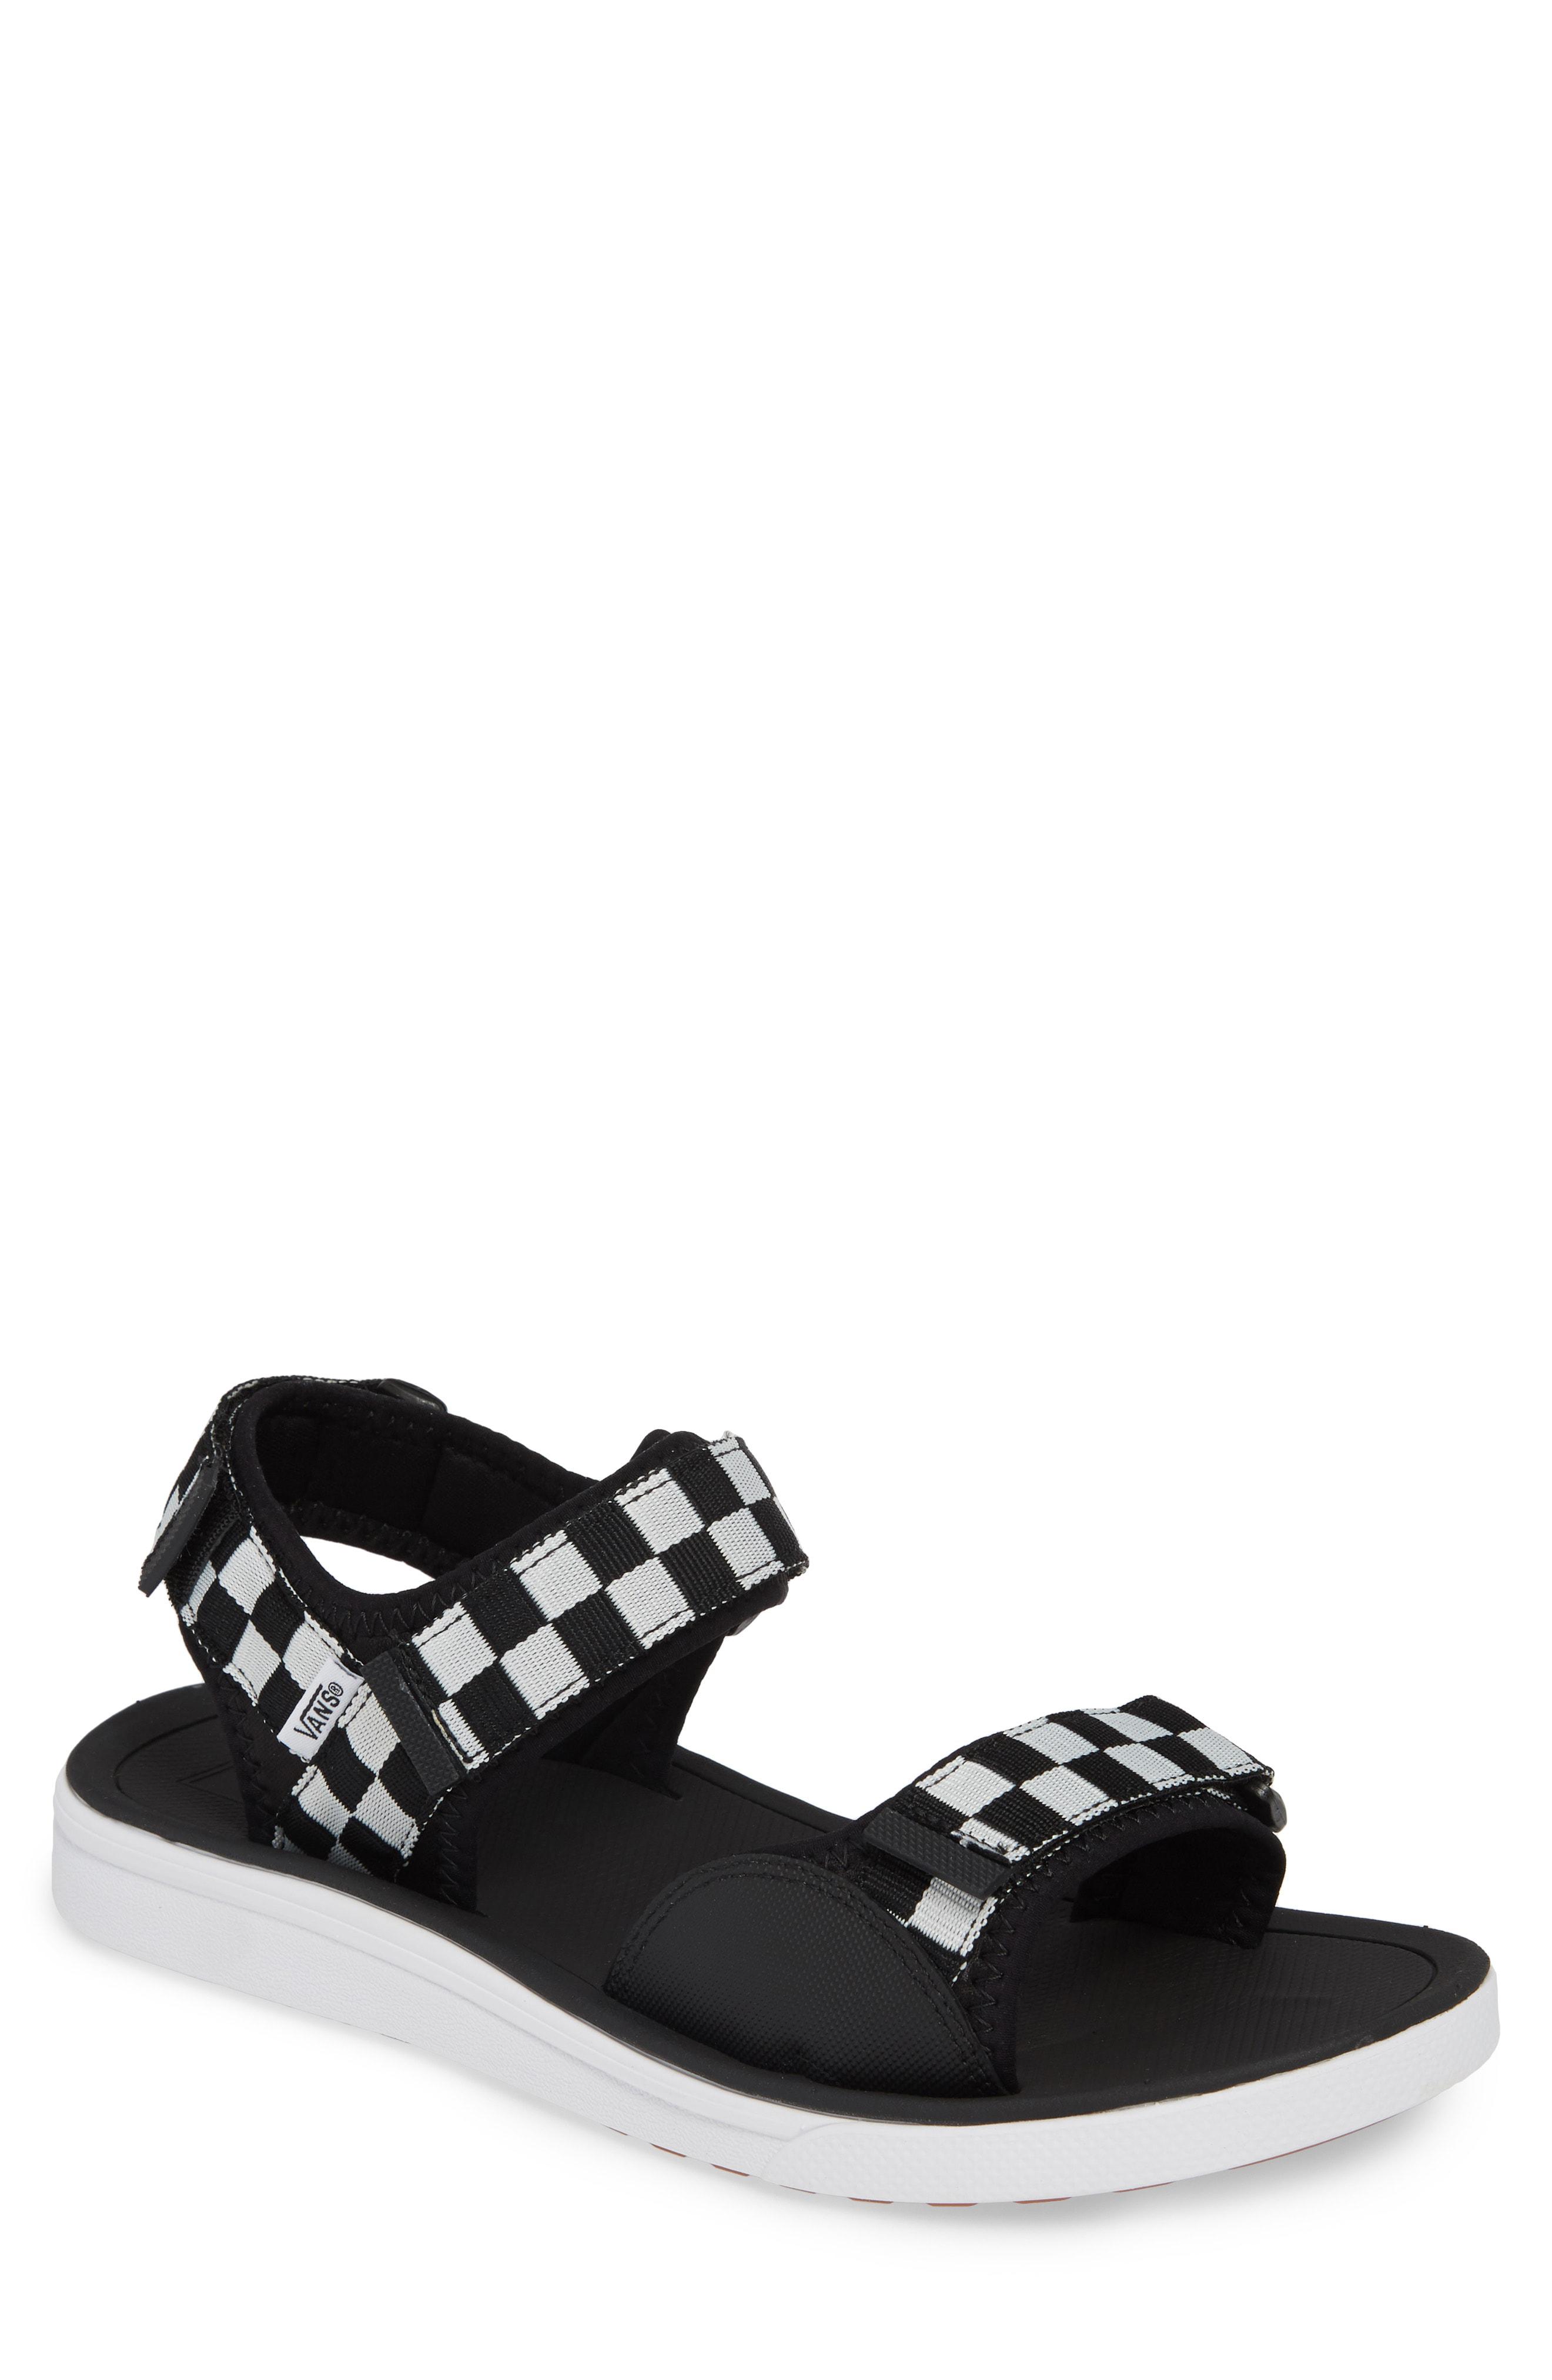 65a749250d21 Vans Ultrarange Tri Lock Sport Sandal In Black  True White Checkerboard